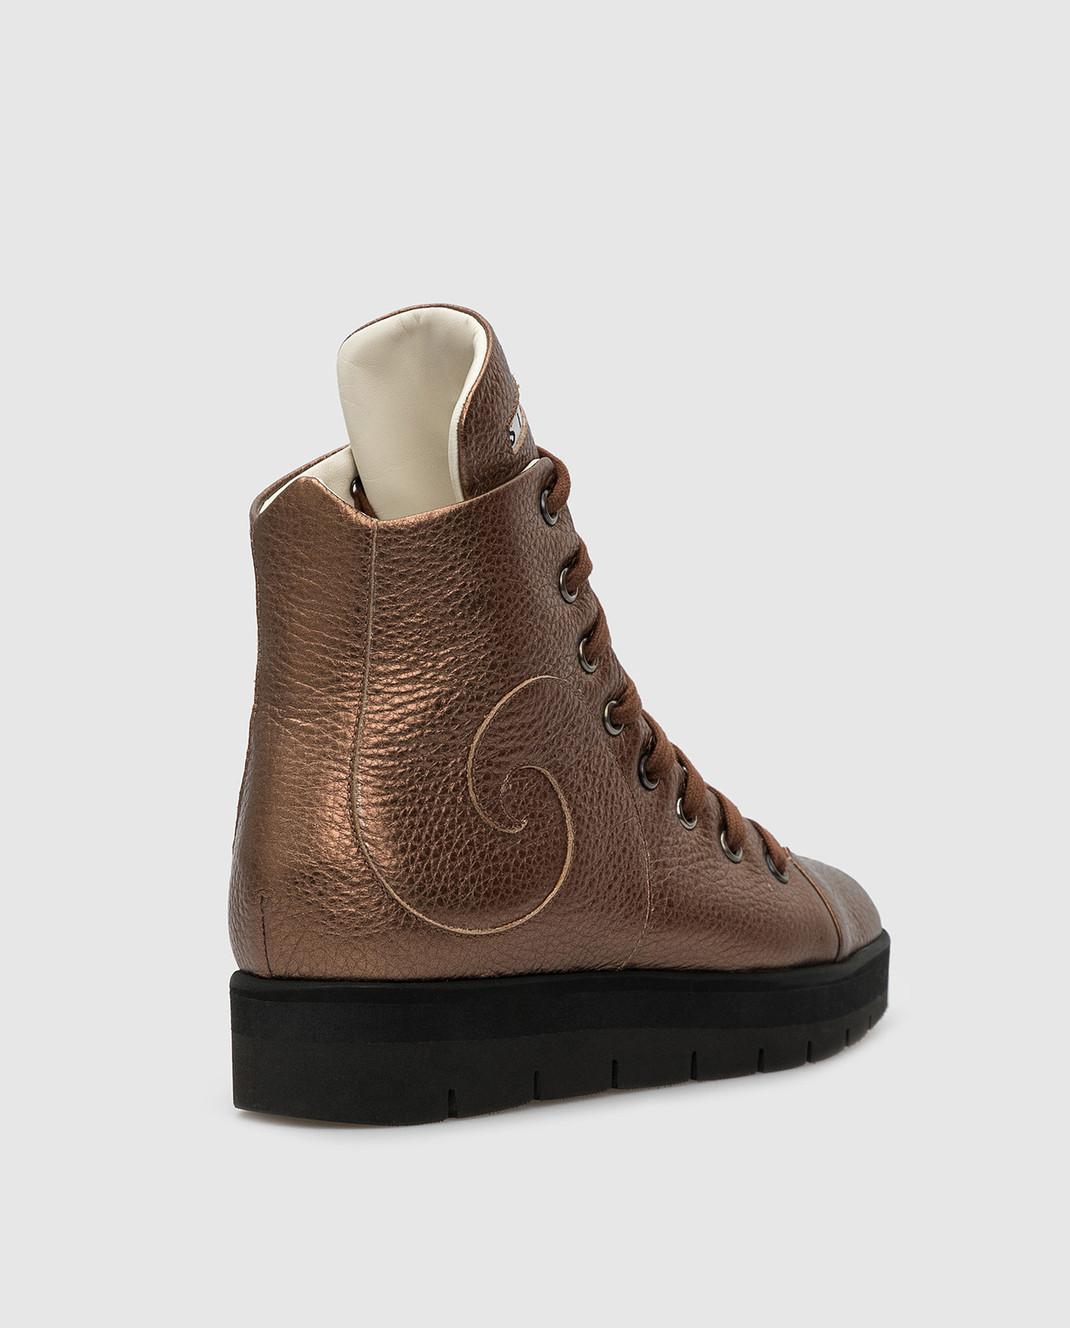 Steiger Бежевые ботинки 1384A изображение 4